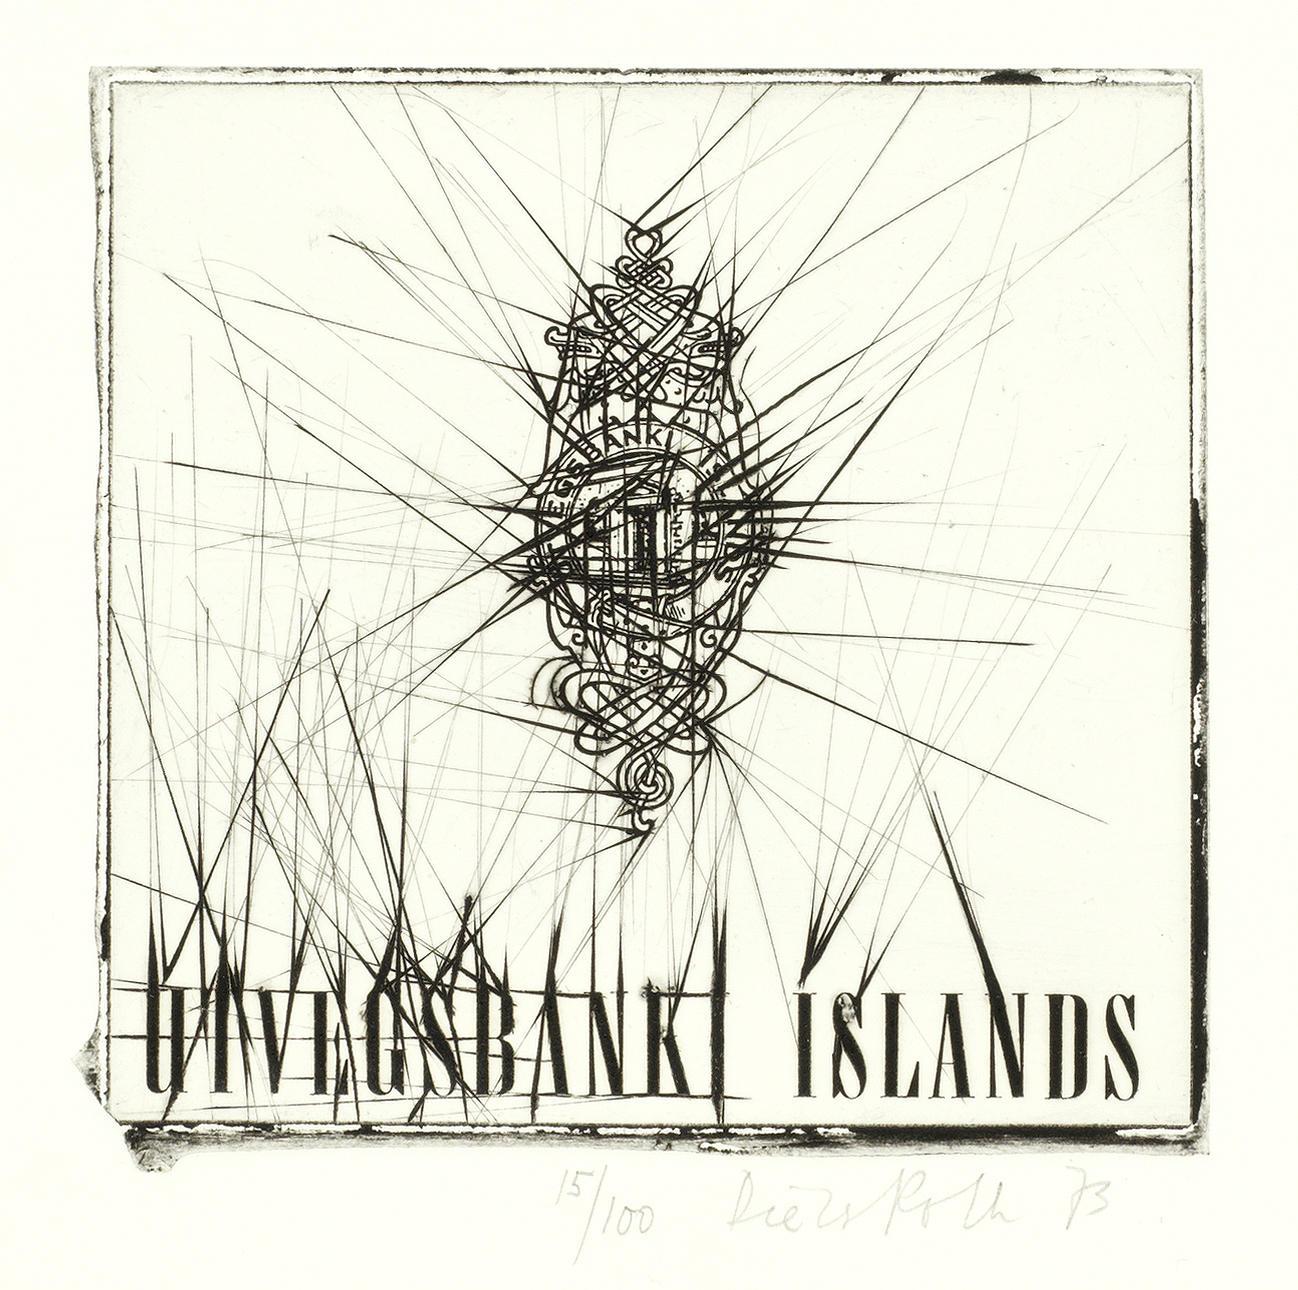 Dieter Roth-Utvegsbanki Islands-1973